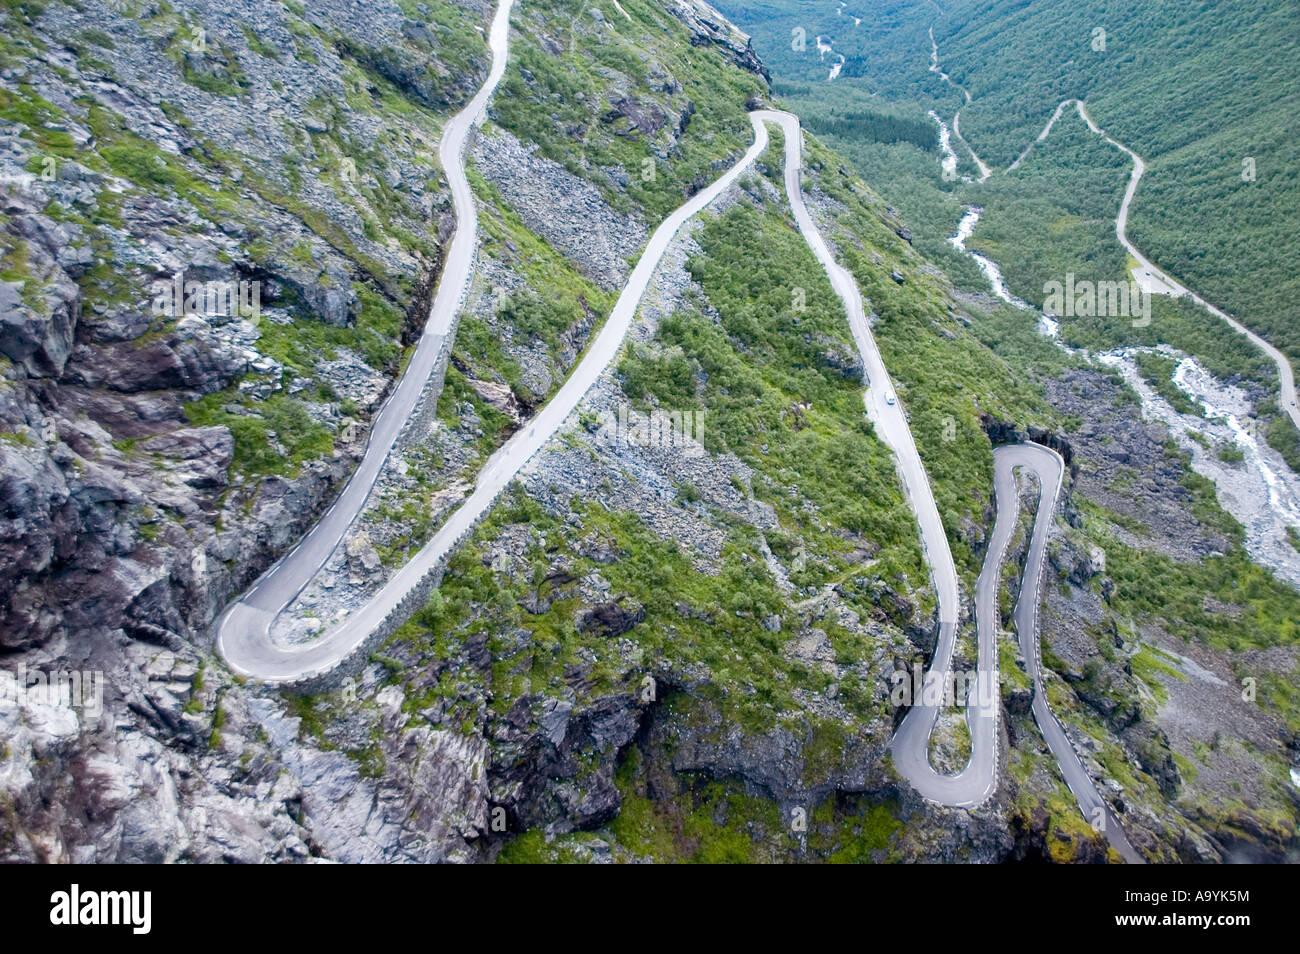 Curve a serpentina di Trollstigen, Trollsteig, vicino Andalsnes, More og Romsdal, Norvegia Immagini Stock